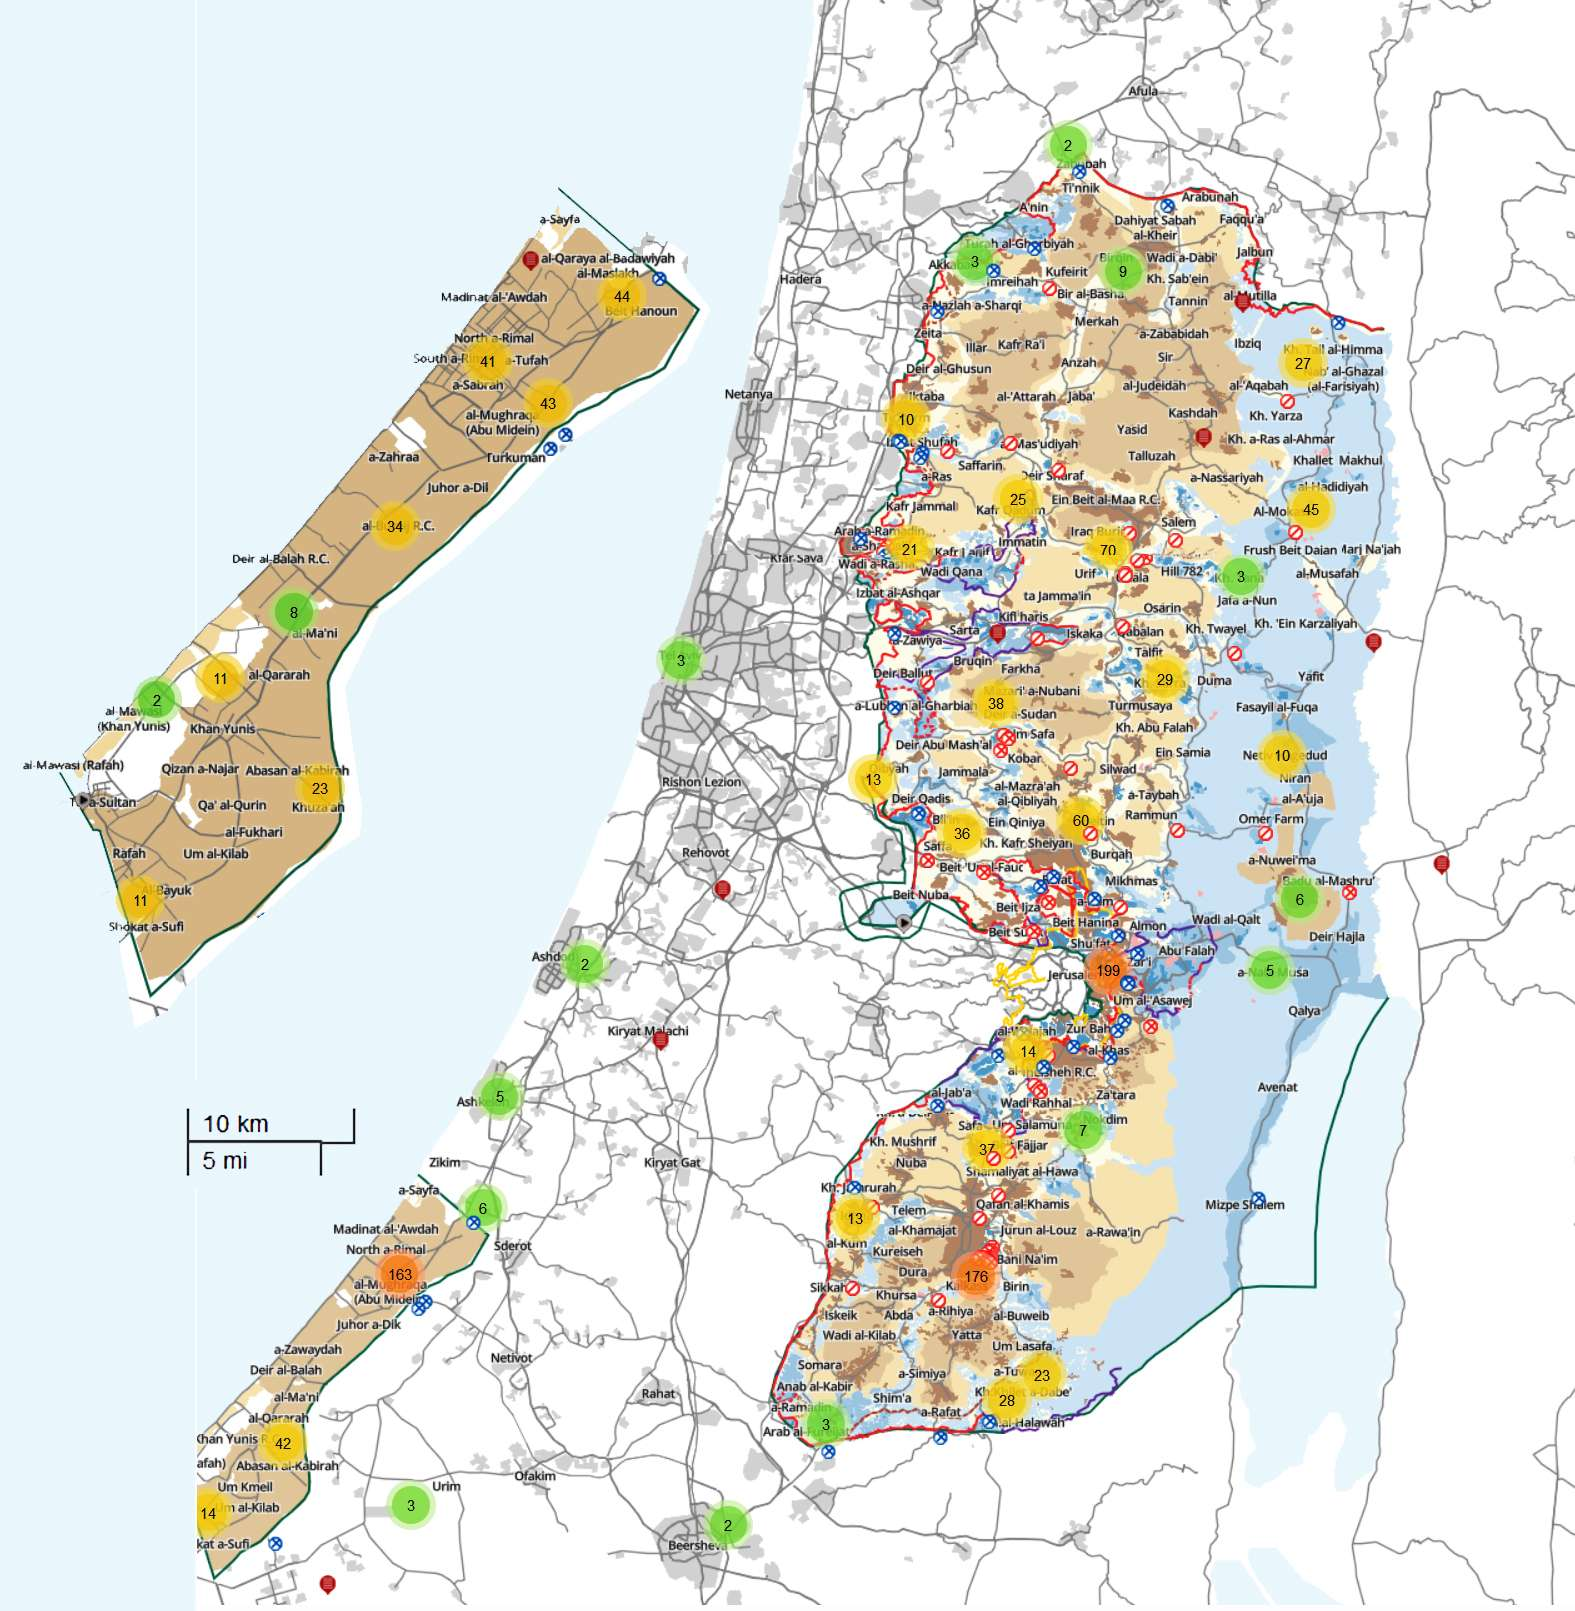 btselem Interactive Map